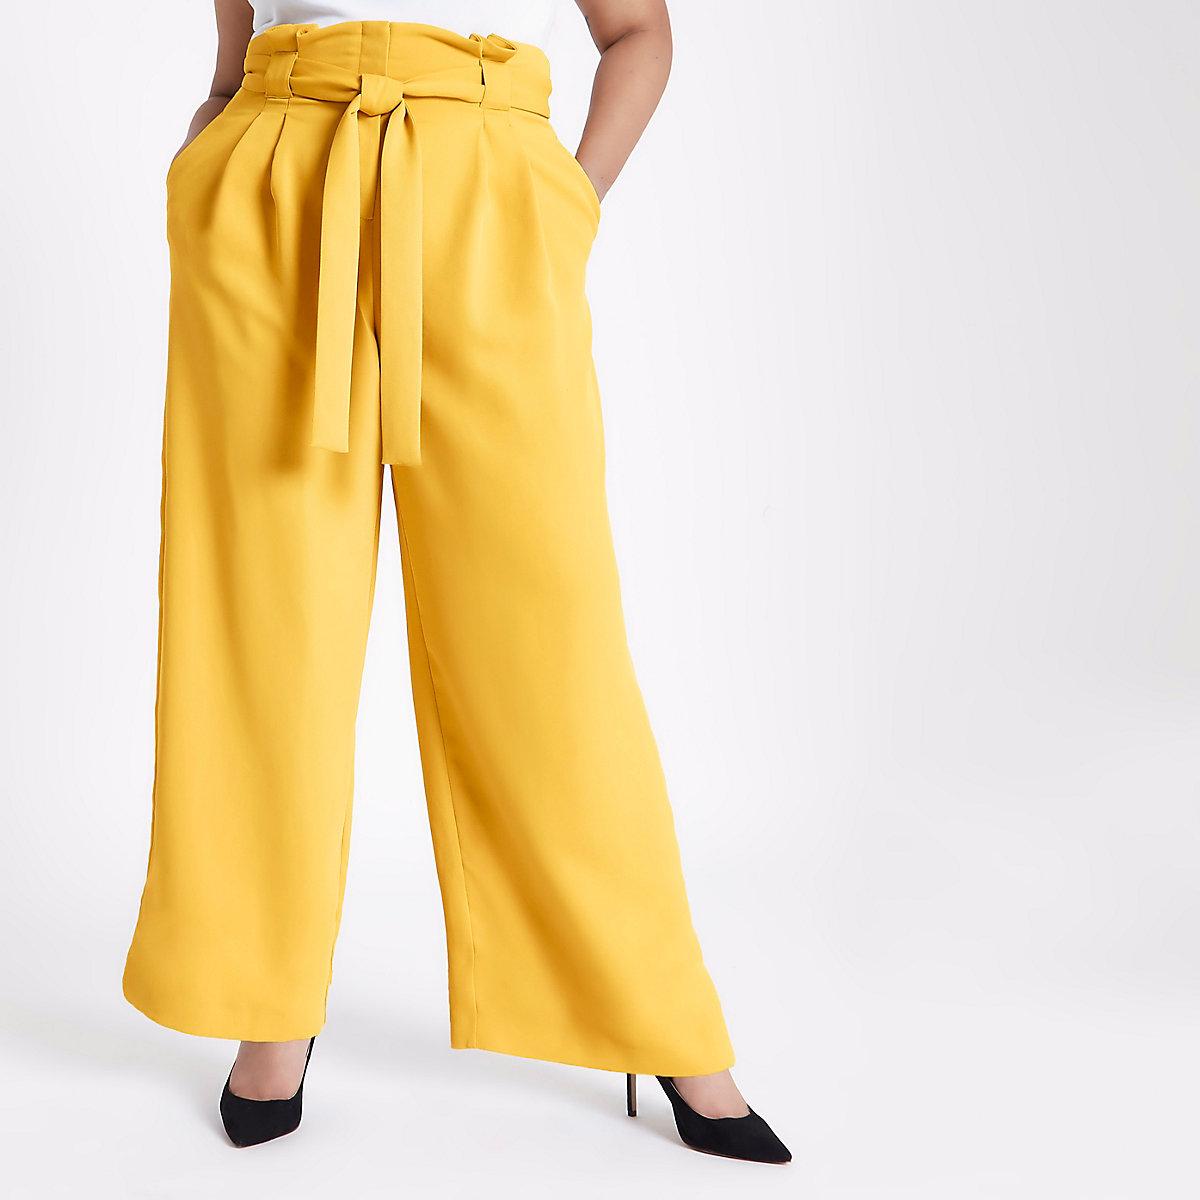 e1e0c2c32984 Plus yellow tapered leg trousers - Wide Leg Trousers - Trousers - women